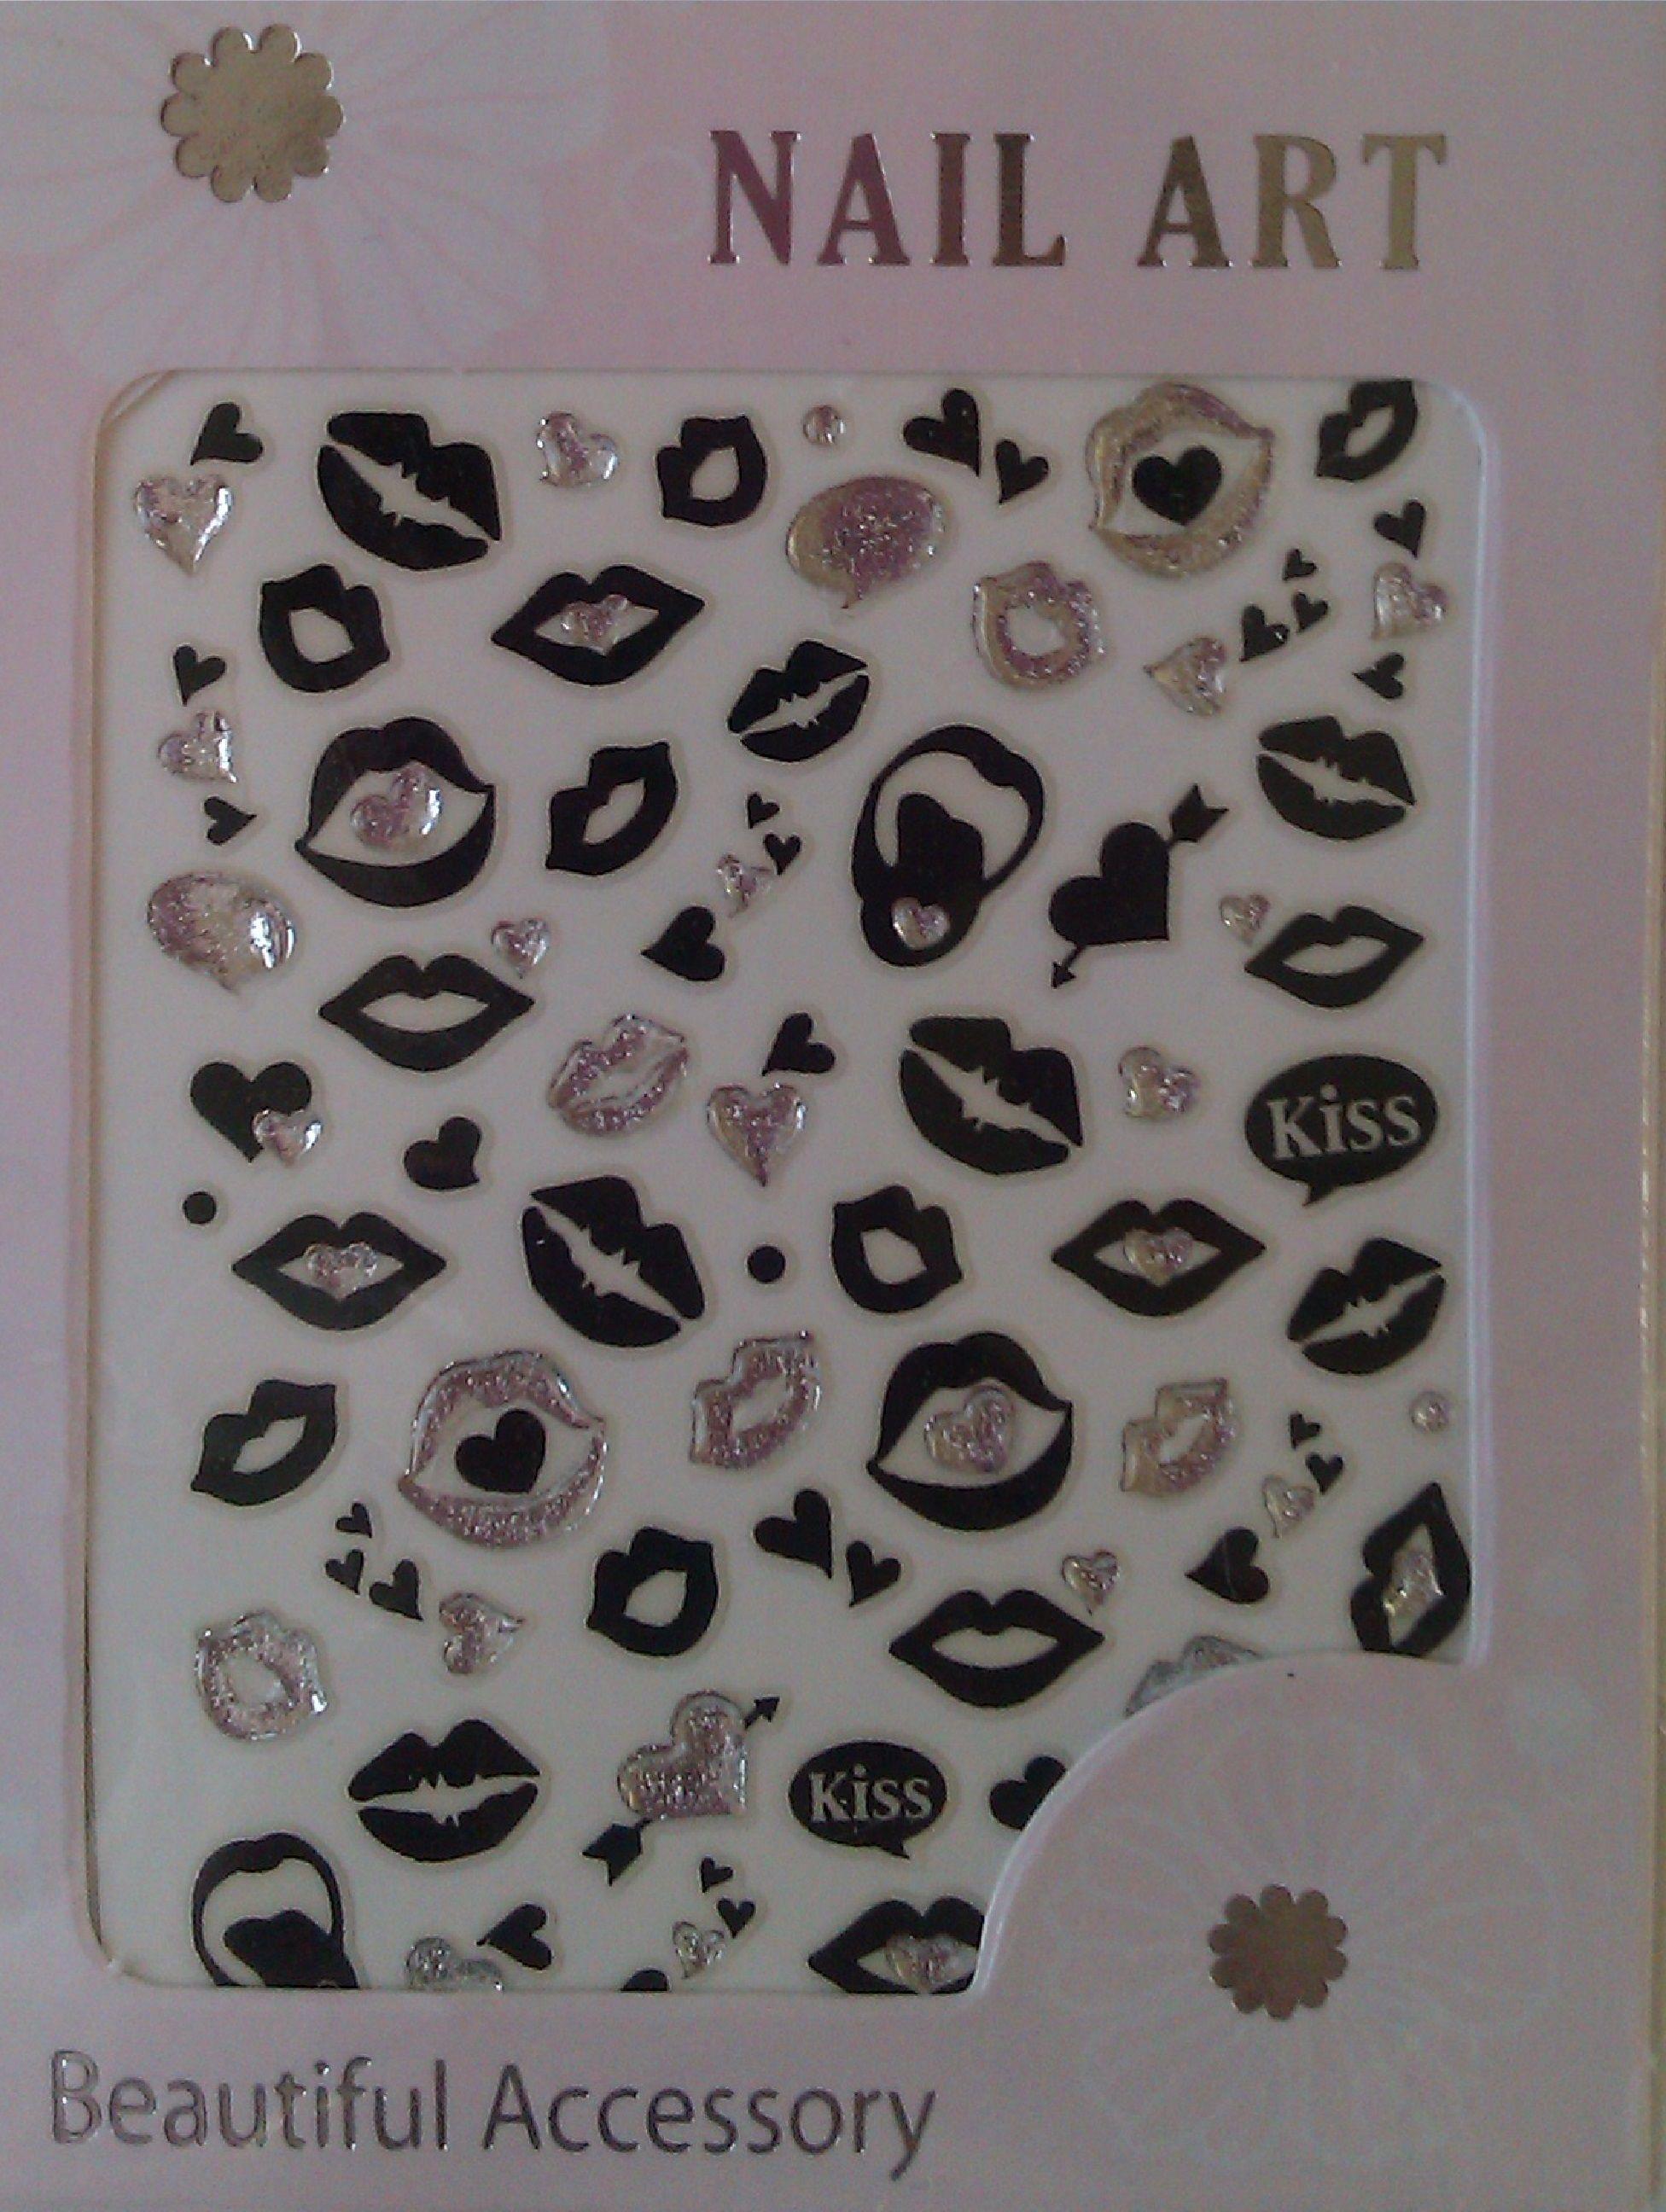 Gem lips & kisses nail stickers £1.00 http//www